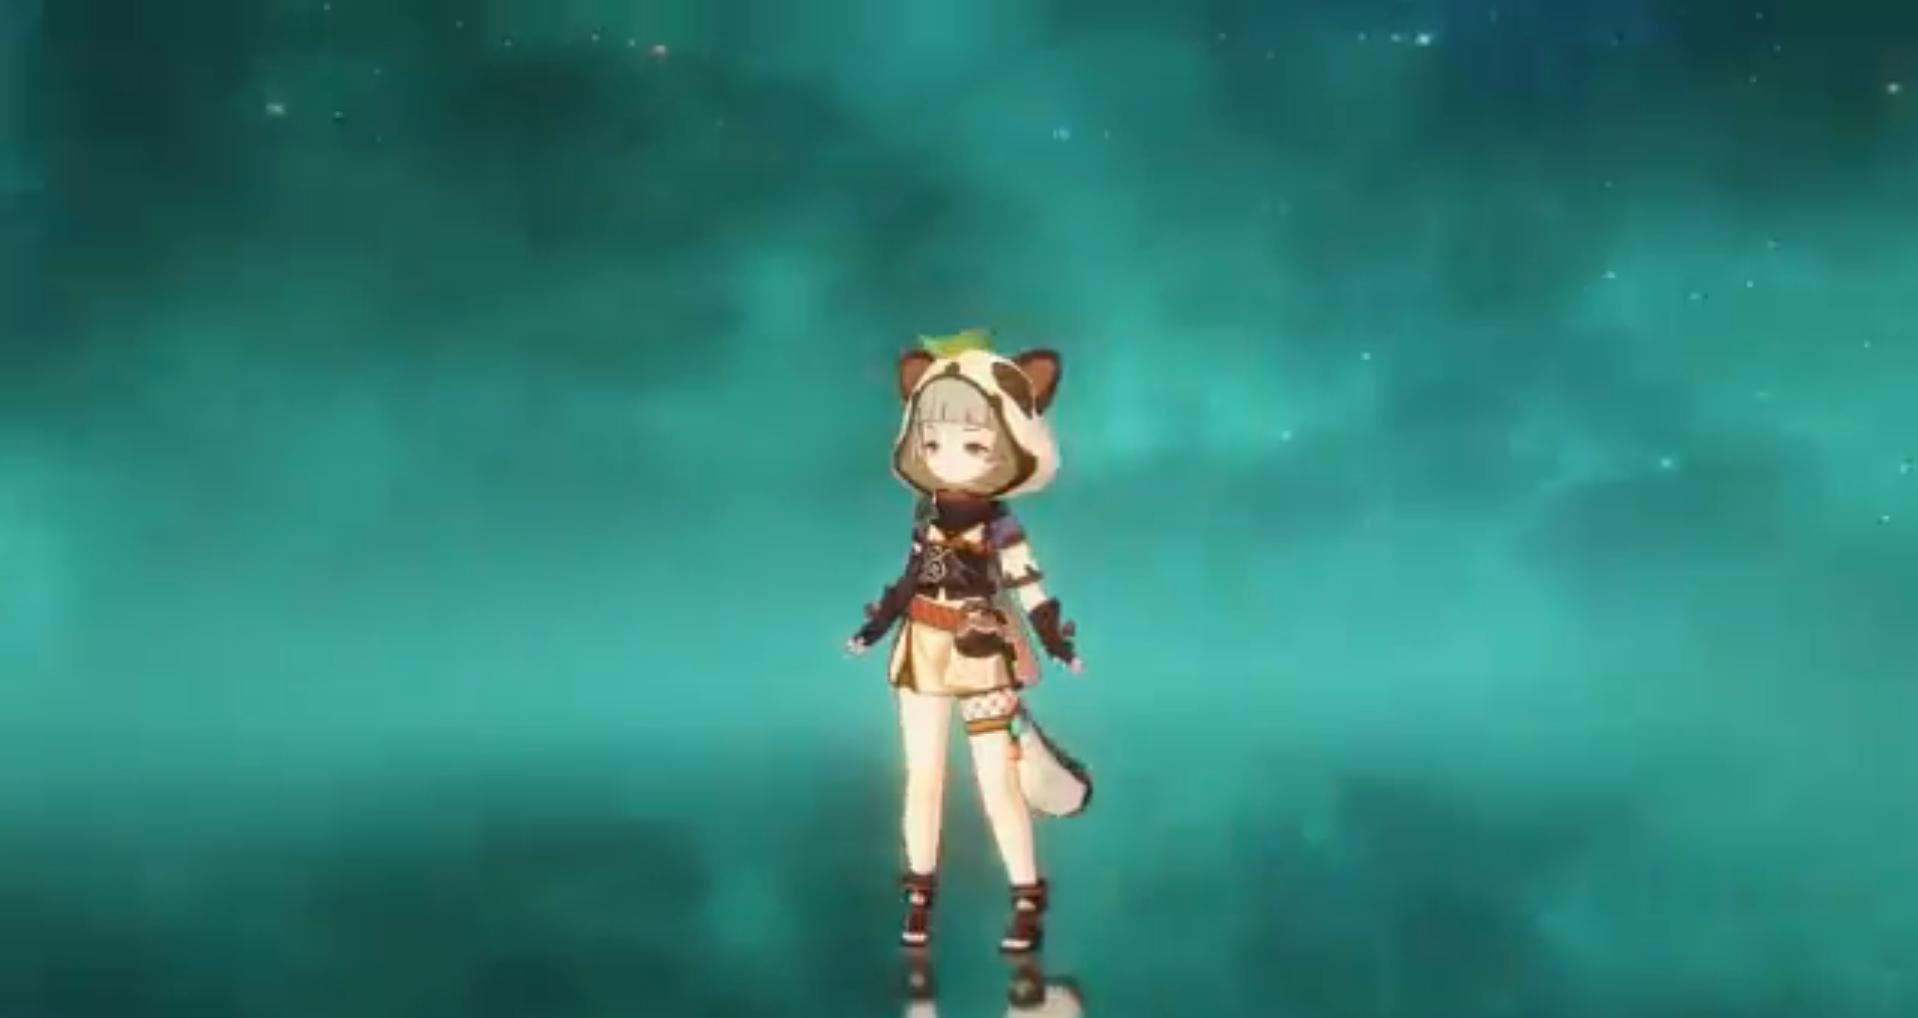 Genshin-Impact-yoimiya-leak-release-date-and-skills-1